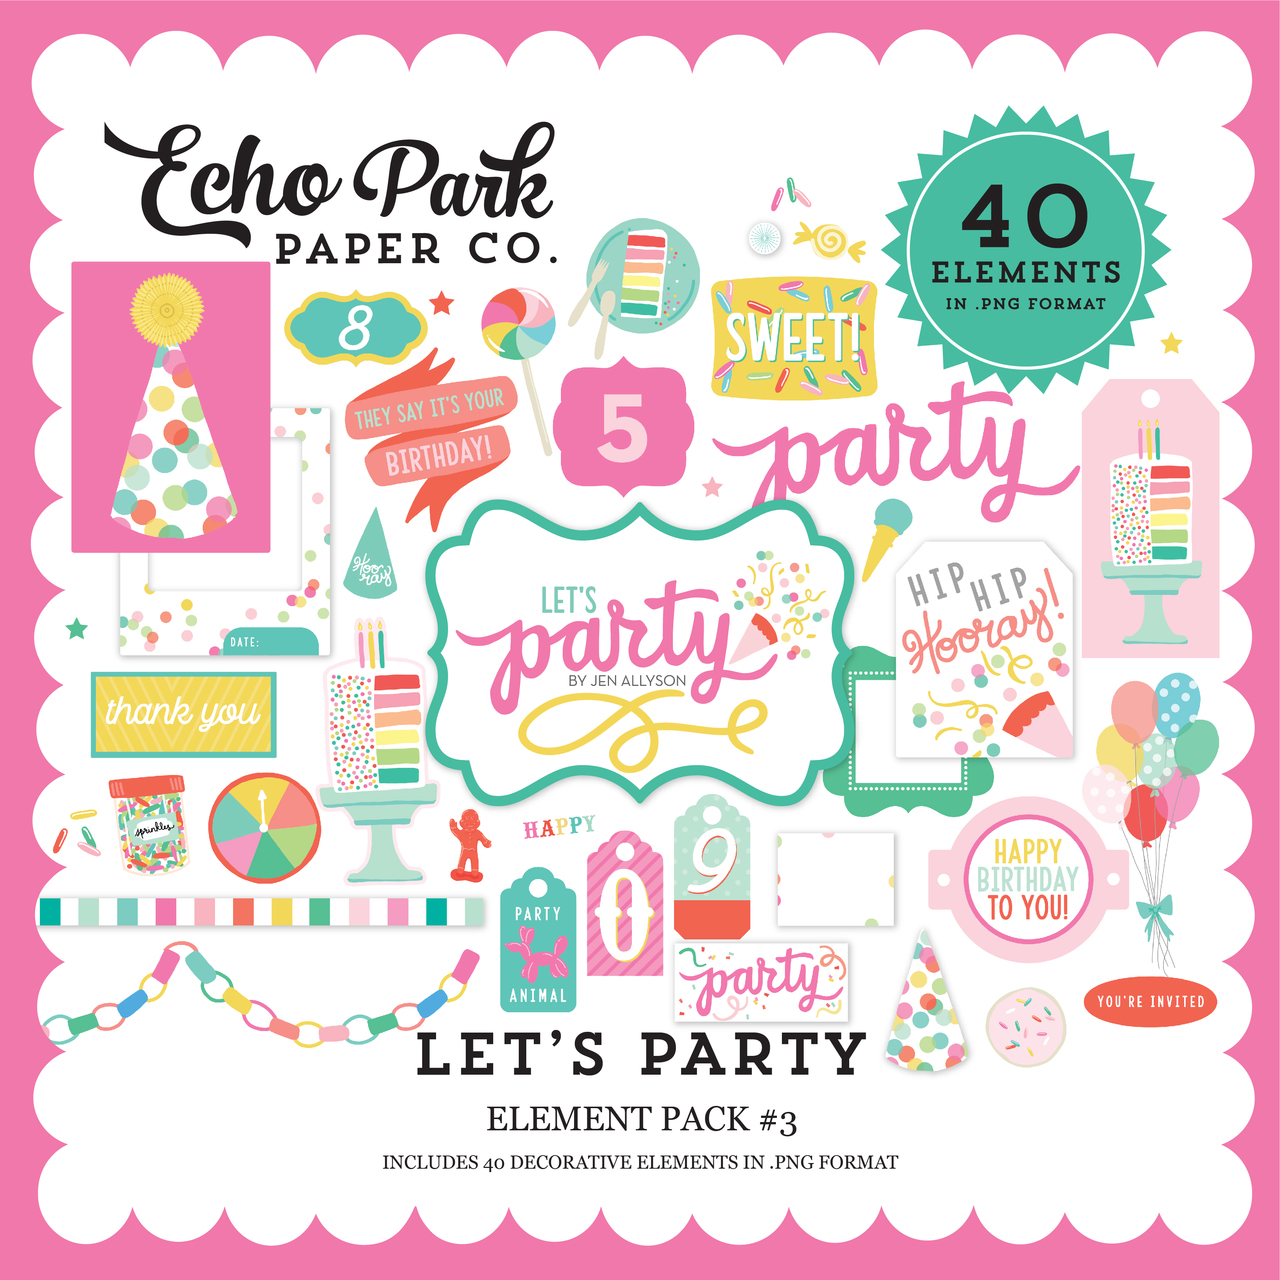 Let's Party Element Pack #3